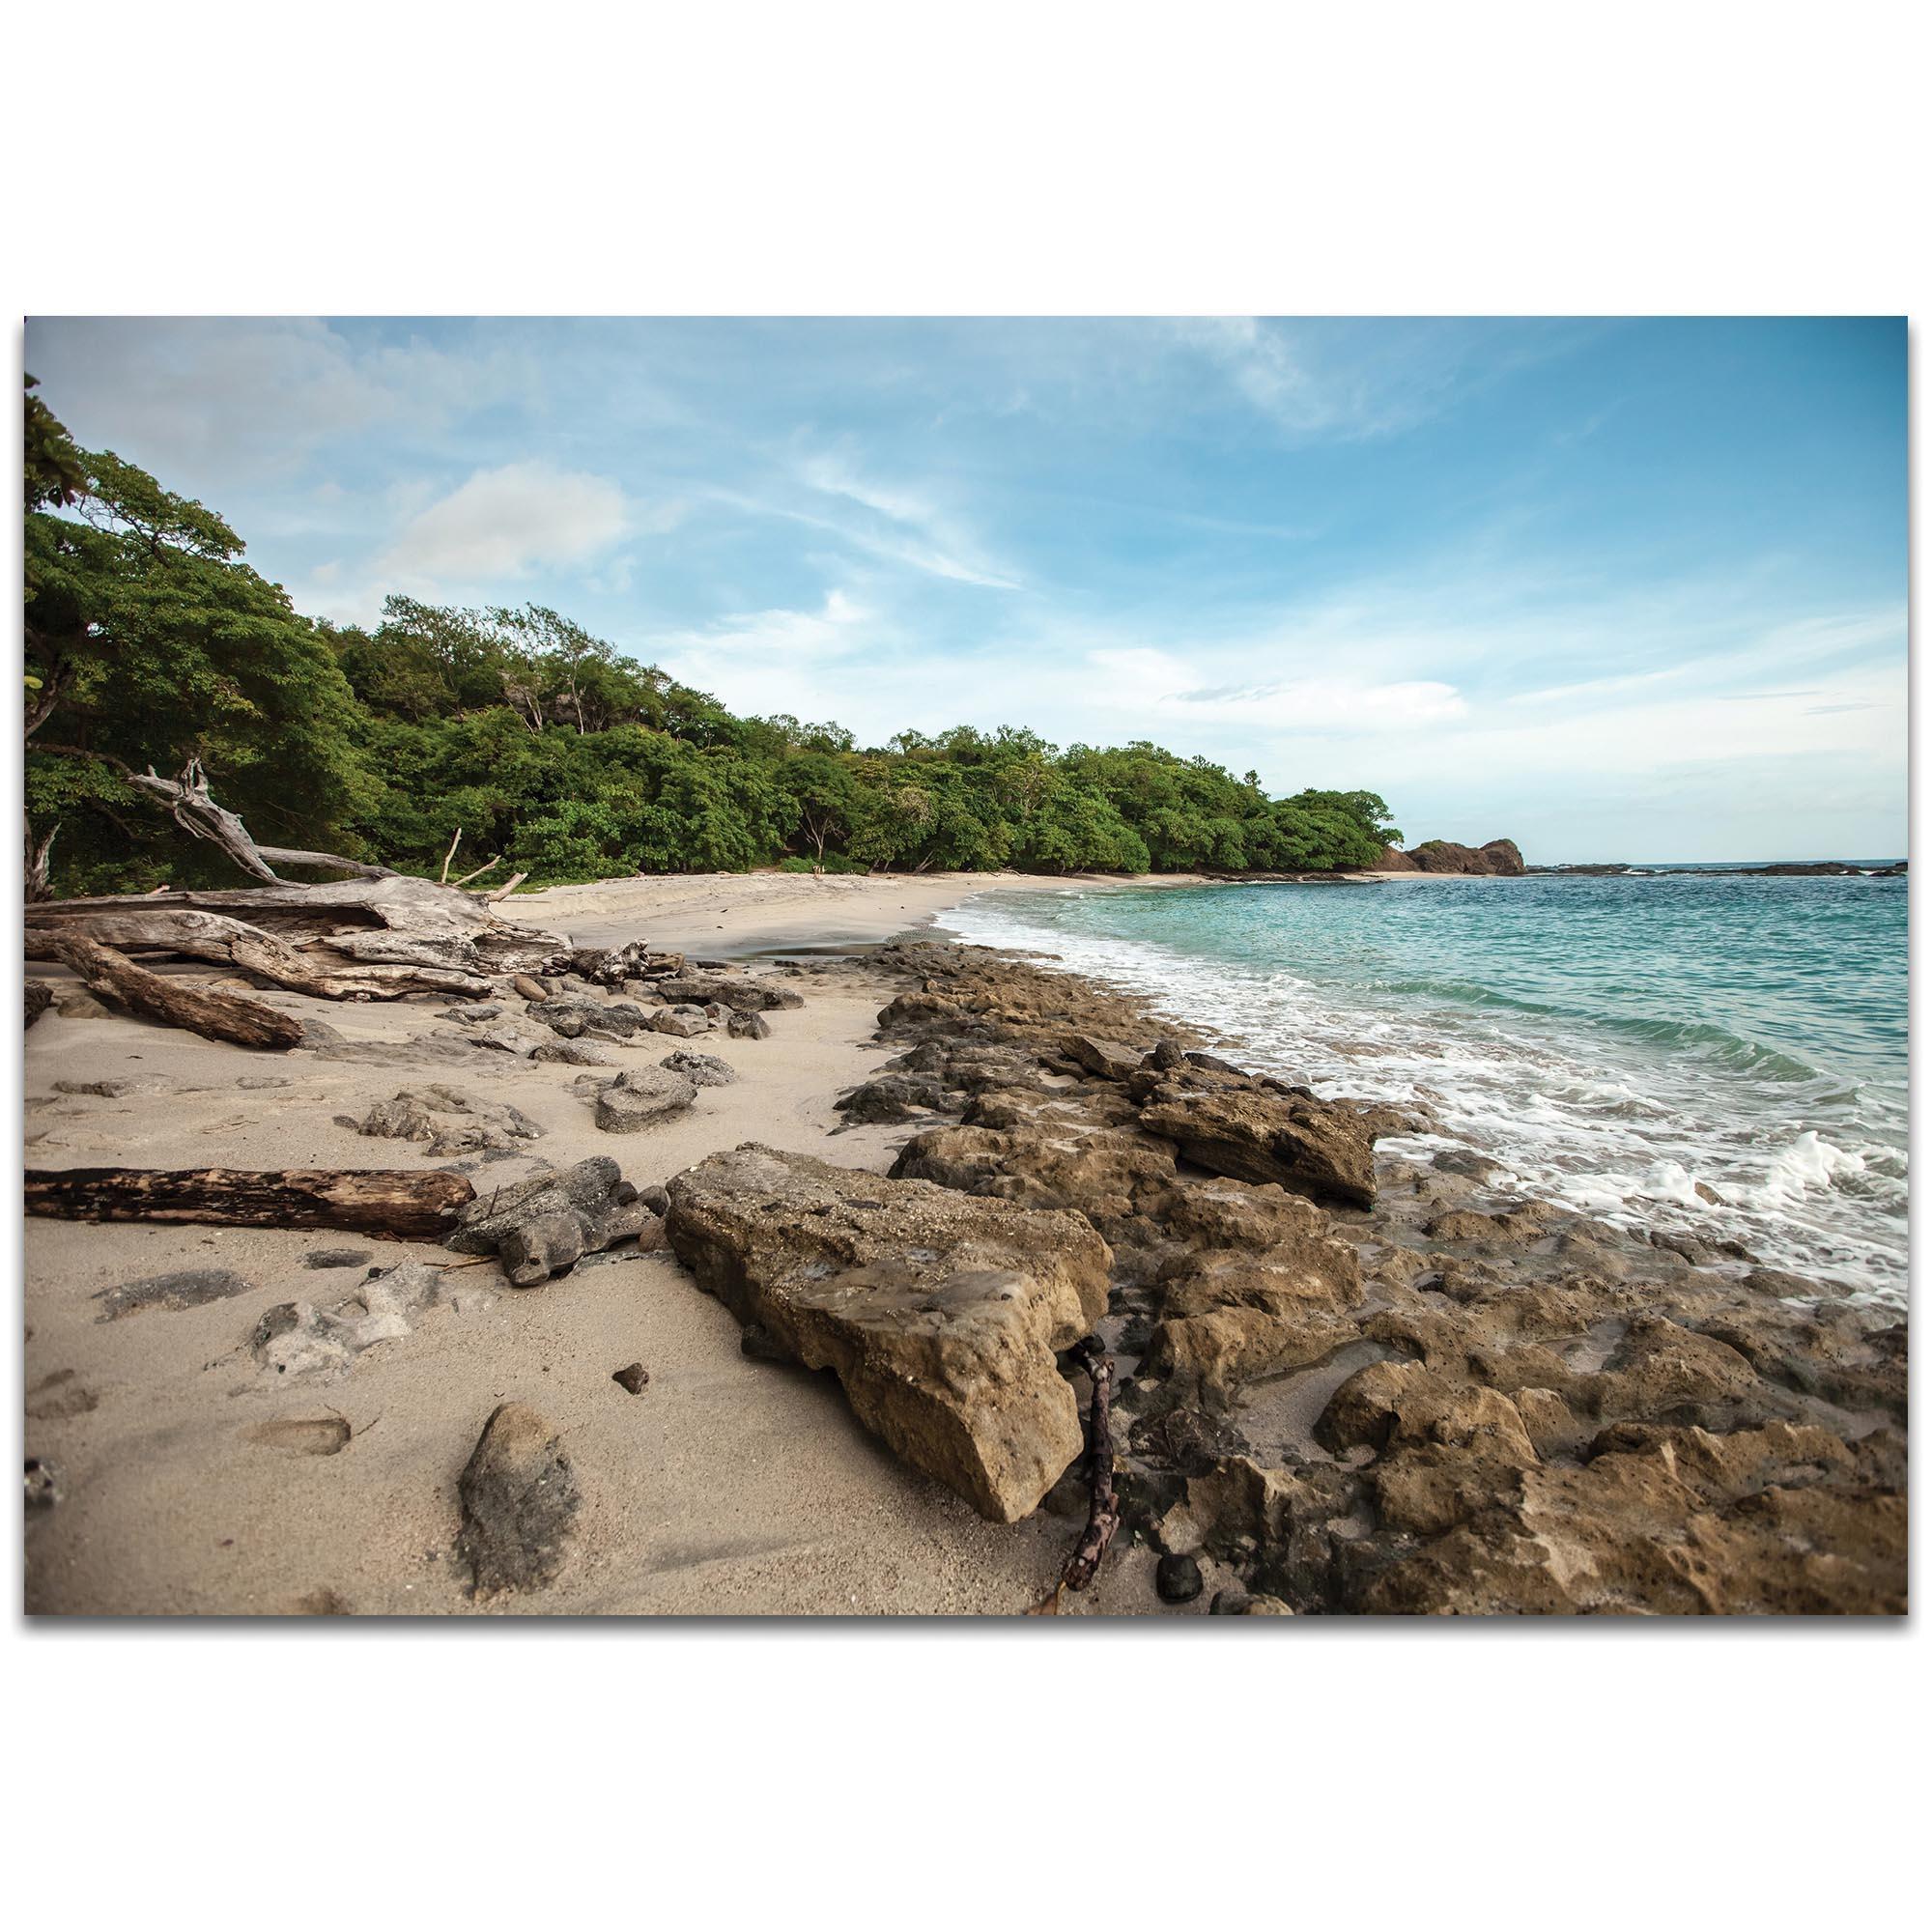 Metal Art Studio – Tropical Junglemeirav Levy – Coastal Wall For Coastal Wall Art (Image 12 of 20)